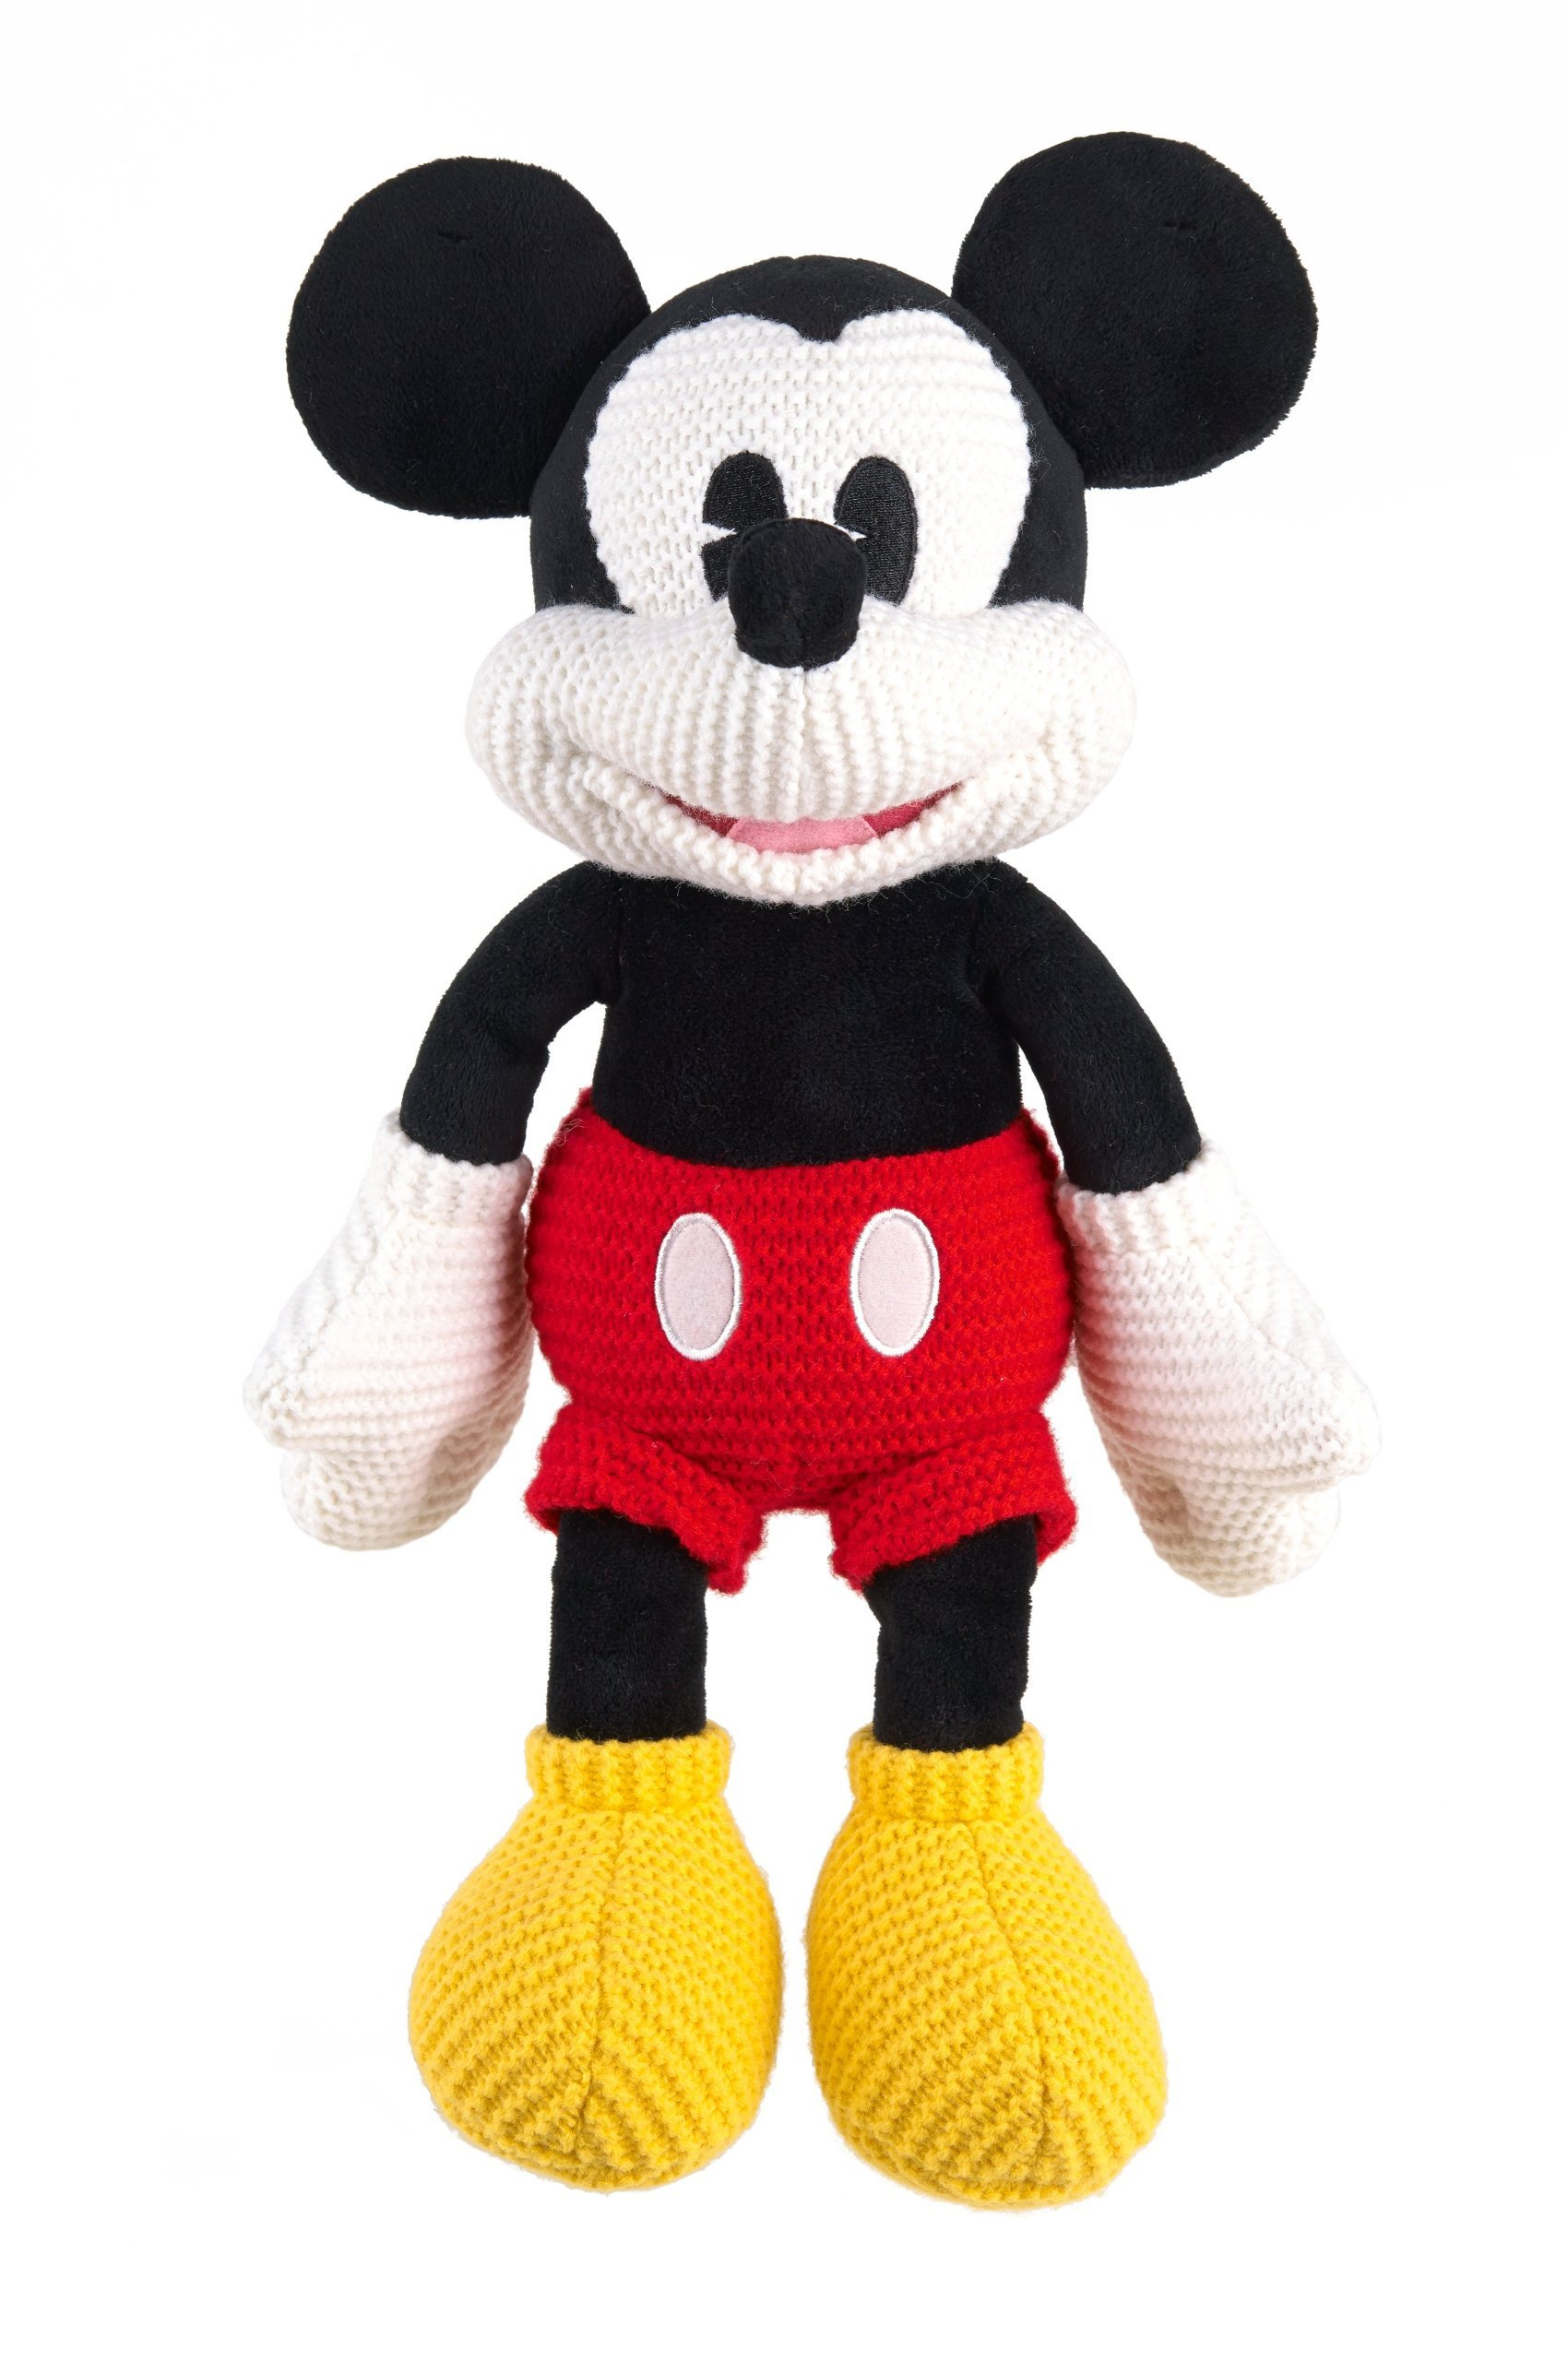 Disney 85th Anniversary Mickey Plush